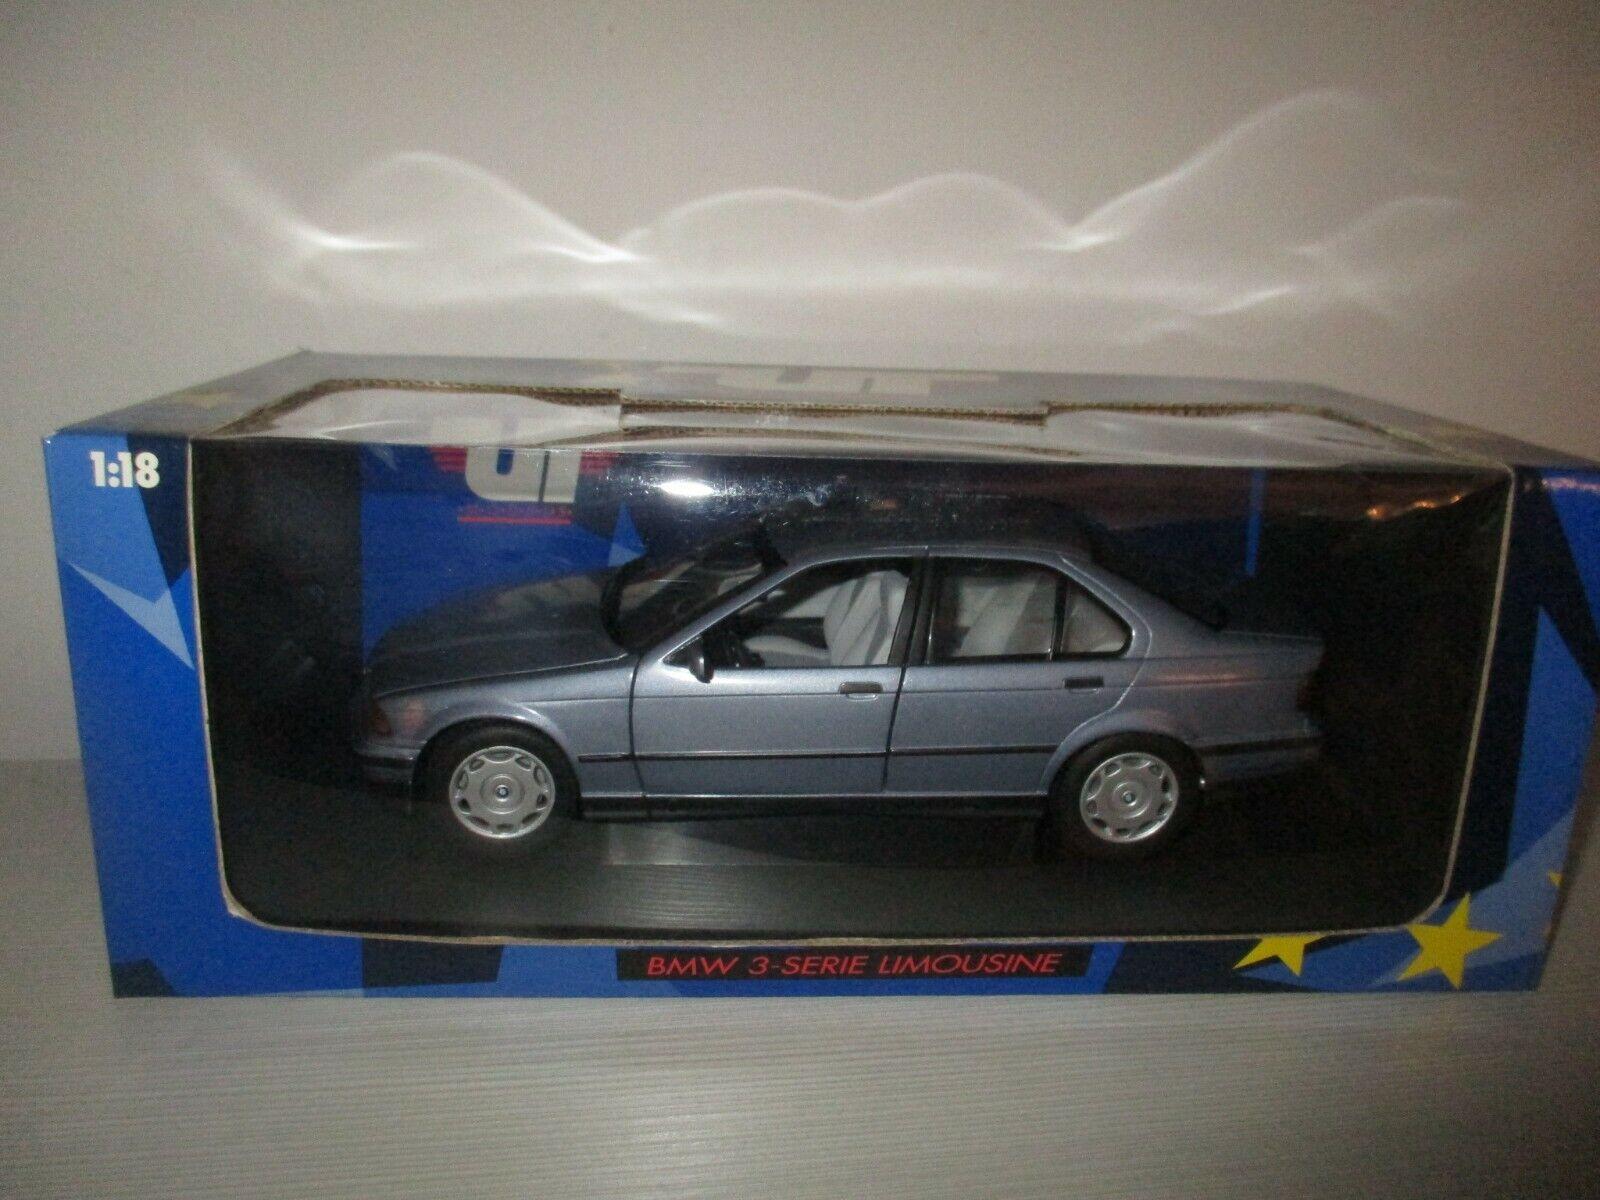 BMW 3 SERIE LIMOUSINE UT MODEL 1 18 COD 180 023300